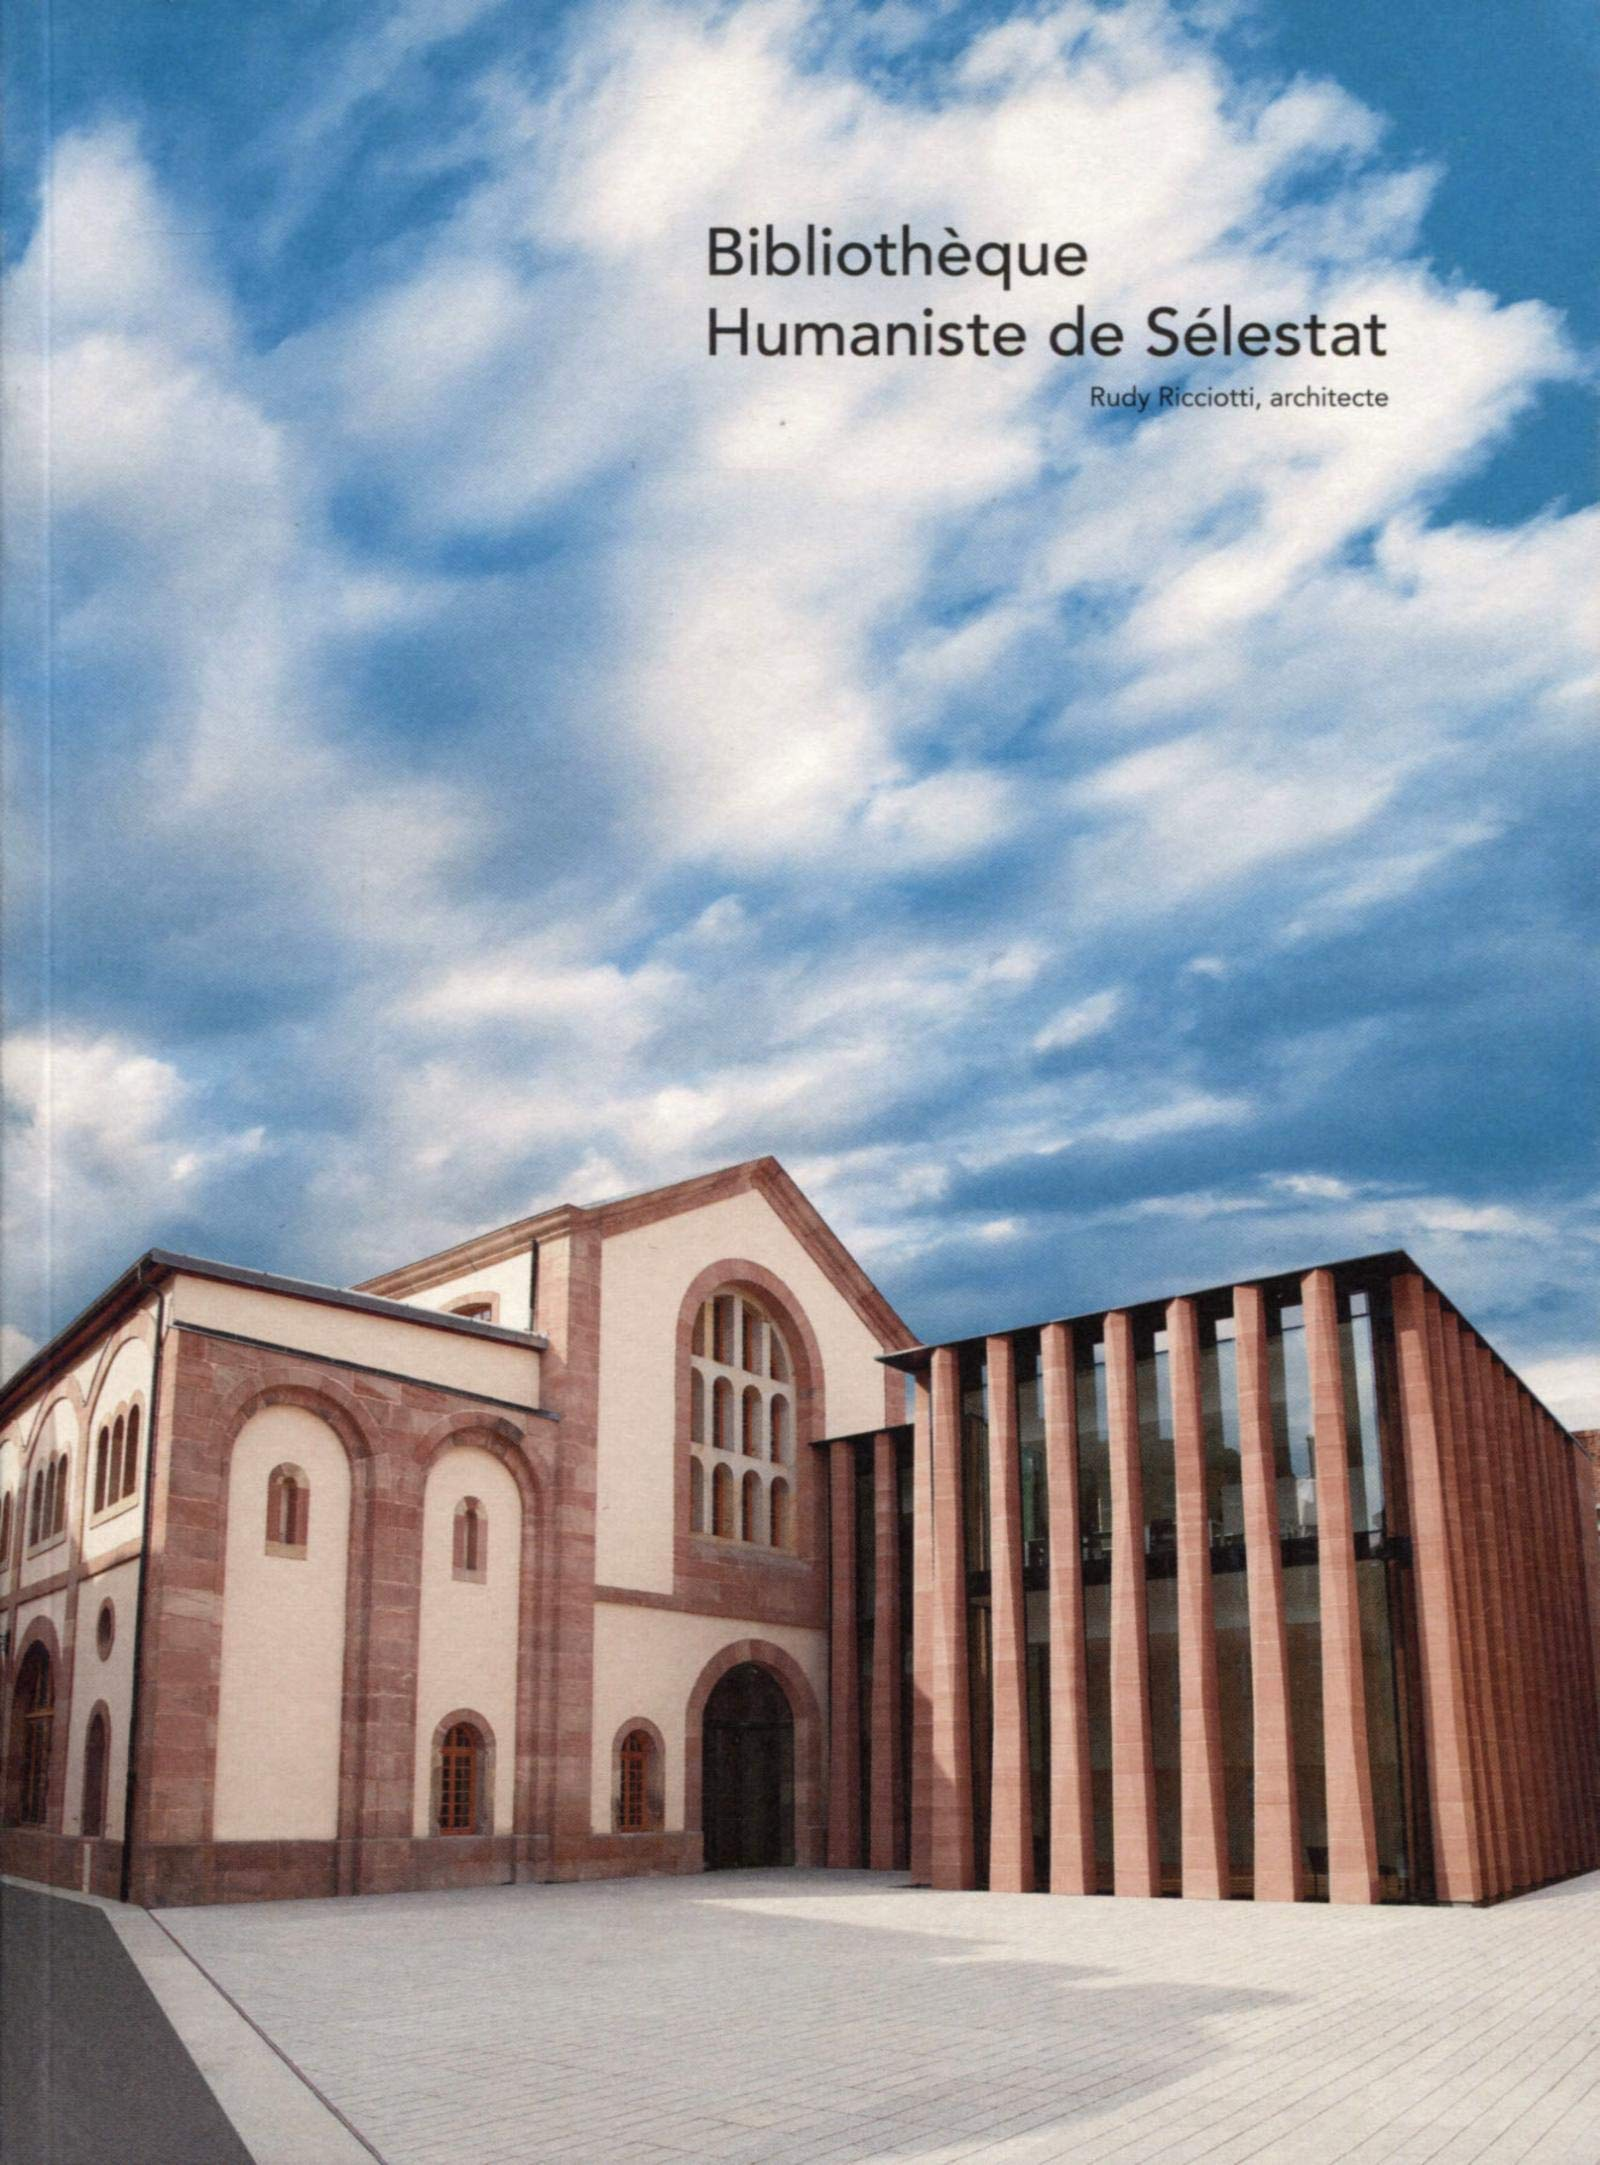 Bibliotheque Humaniste De Selestat Rudi Ricciotti Architecte L Esprit Du Lieu Architecture French Edition Collectif 9782357335103 Amazon Com Books